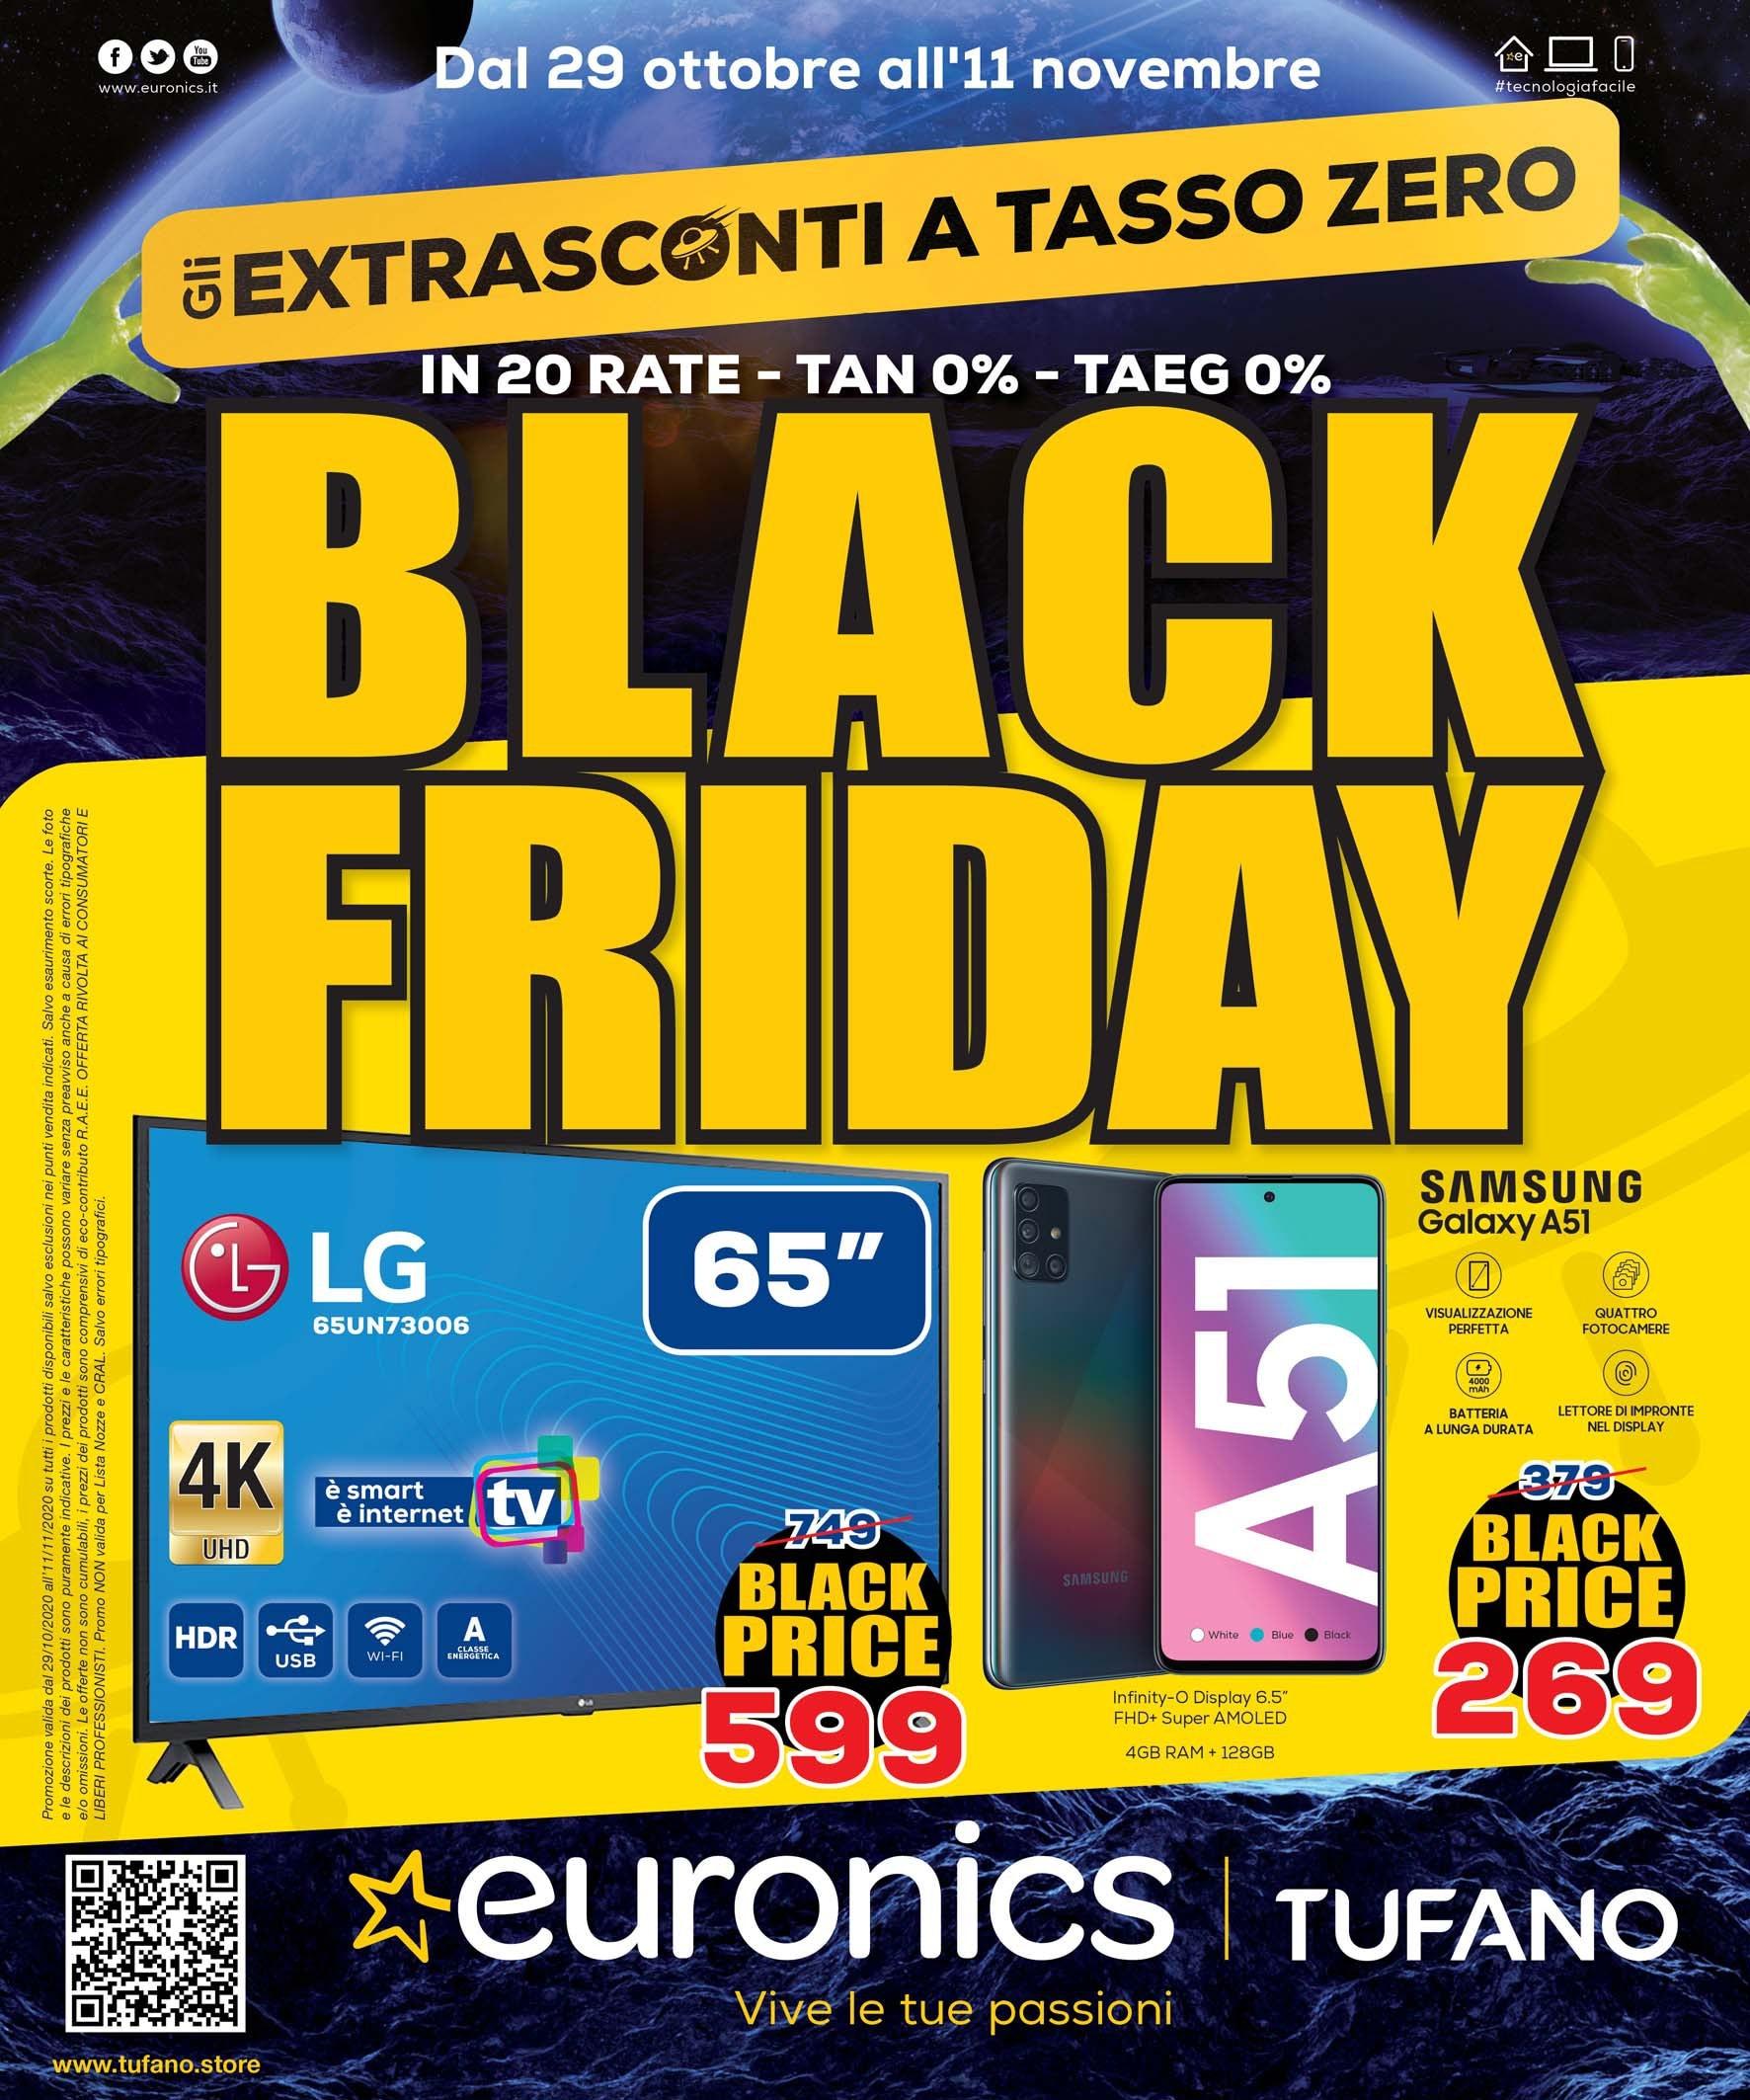 Euronics Extrasconti a Tasso Zero Black Friday (1)